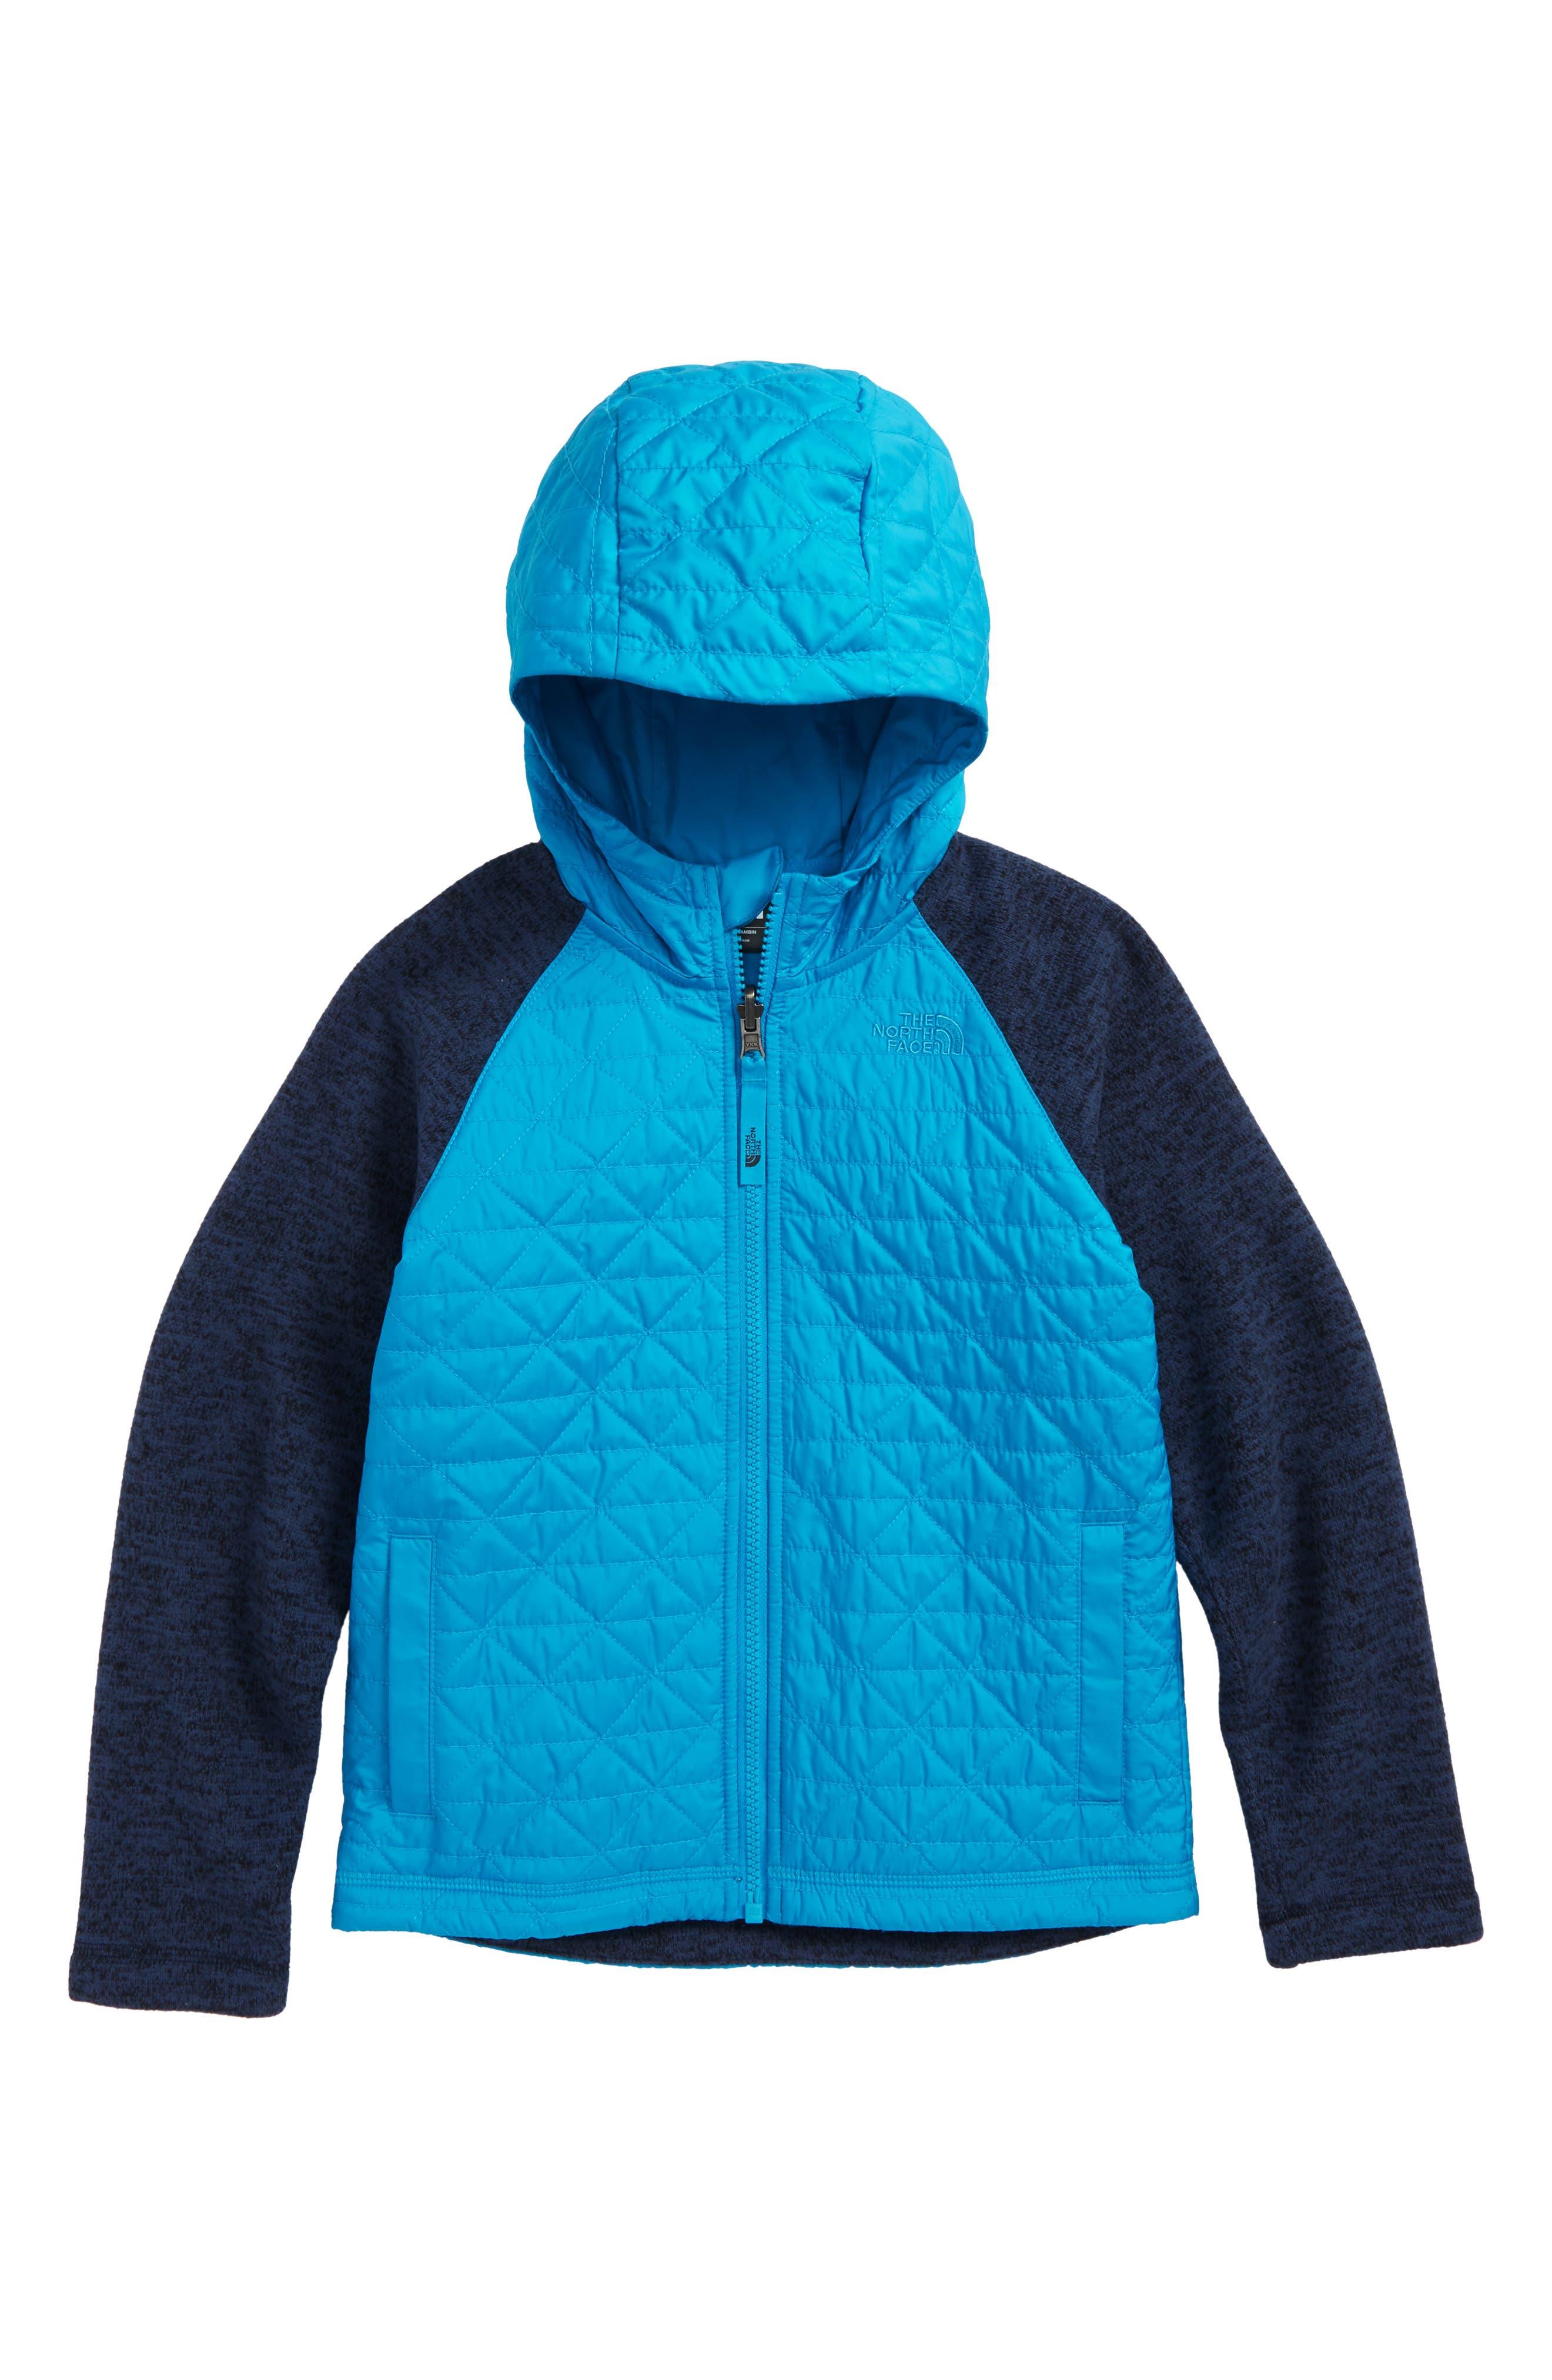 Water Repellent Quilted Sweater Fleece Jacket,                         Main,                         color, COSMIC BLUE/ HYPER BLUE